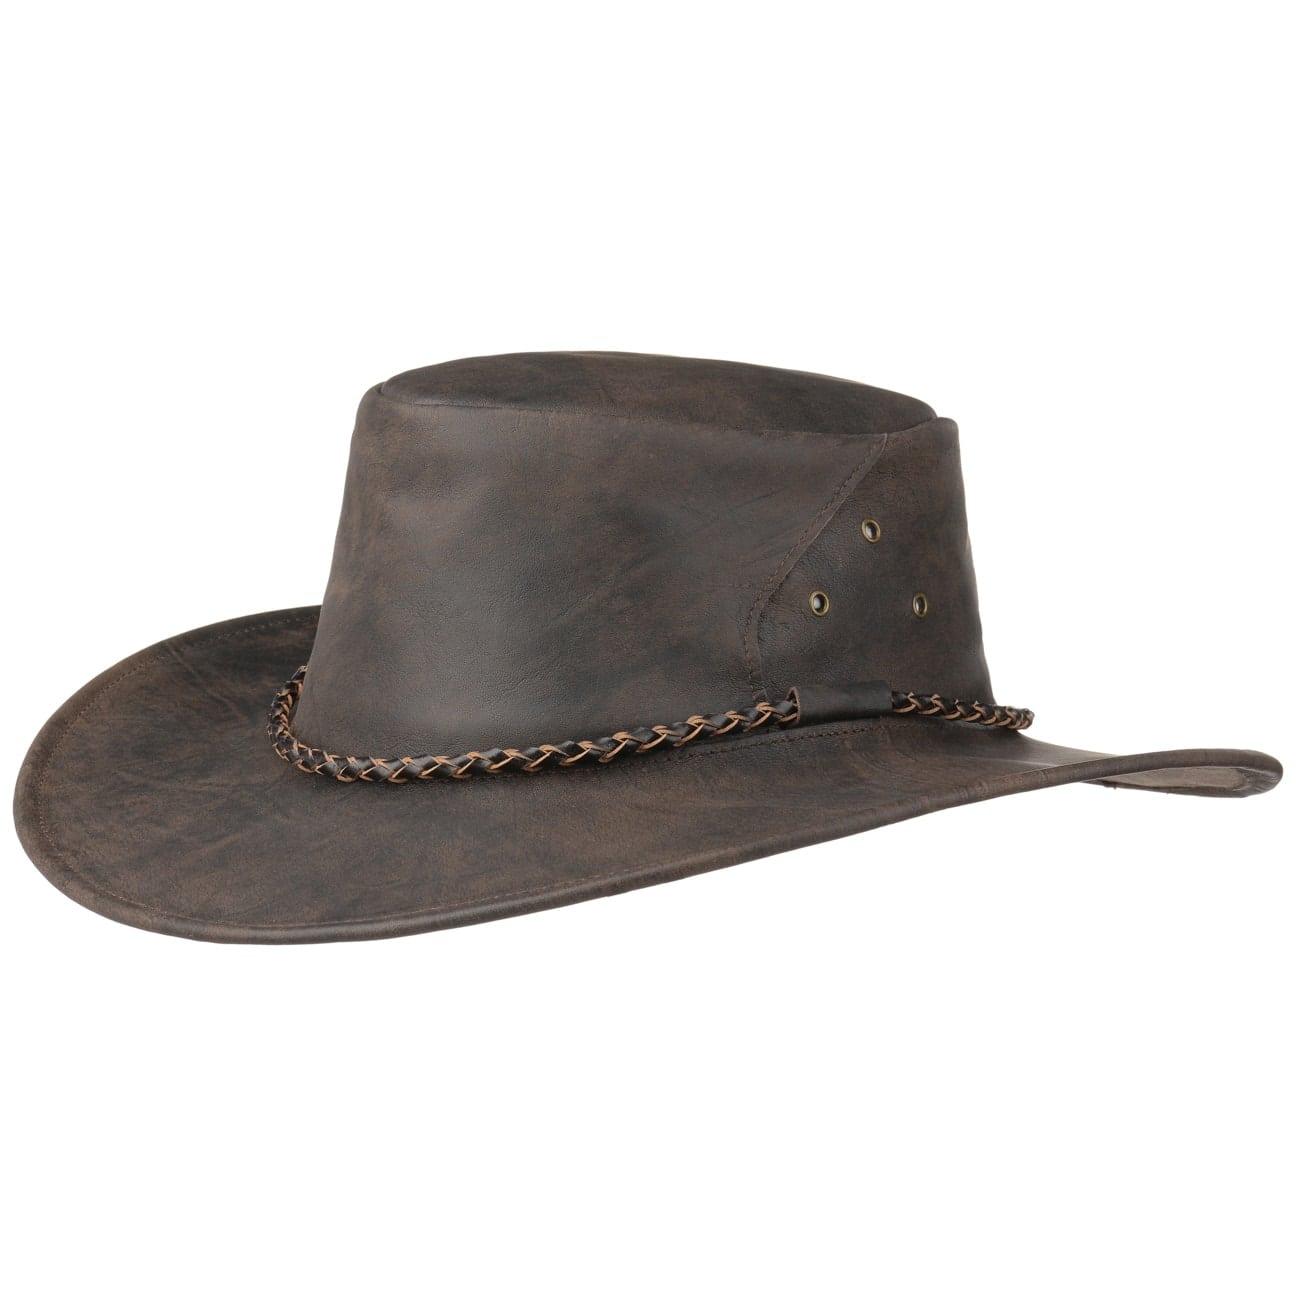 Sombrero Piel Narrabeen by Kakadu Traders  sombrero outback